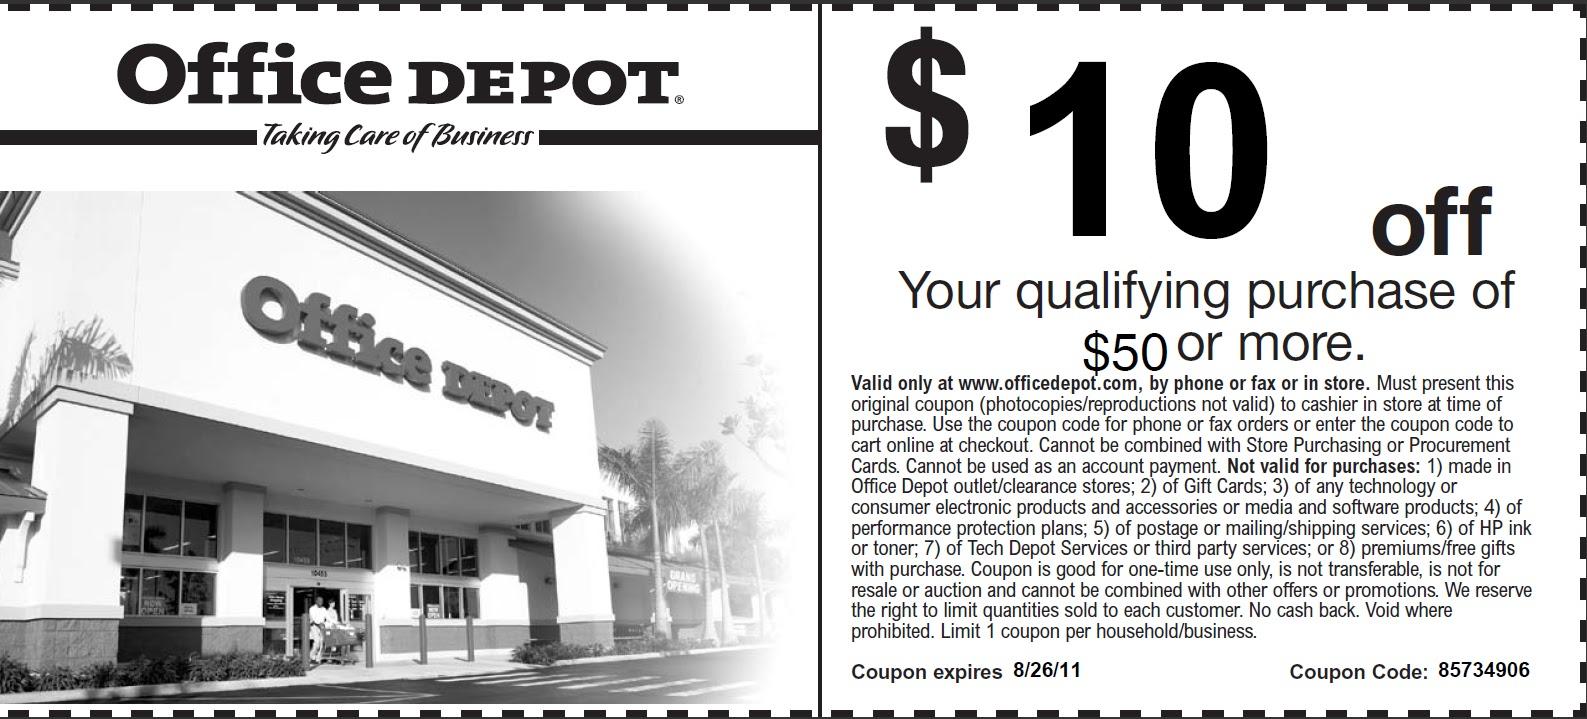 Office depot discount coupon